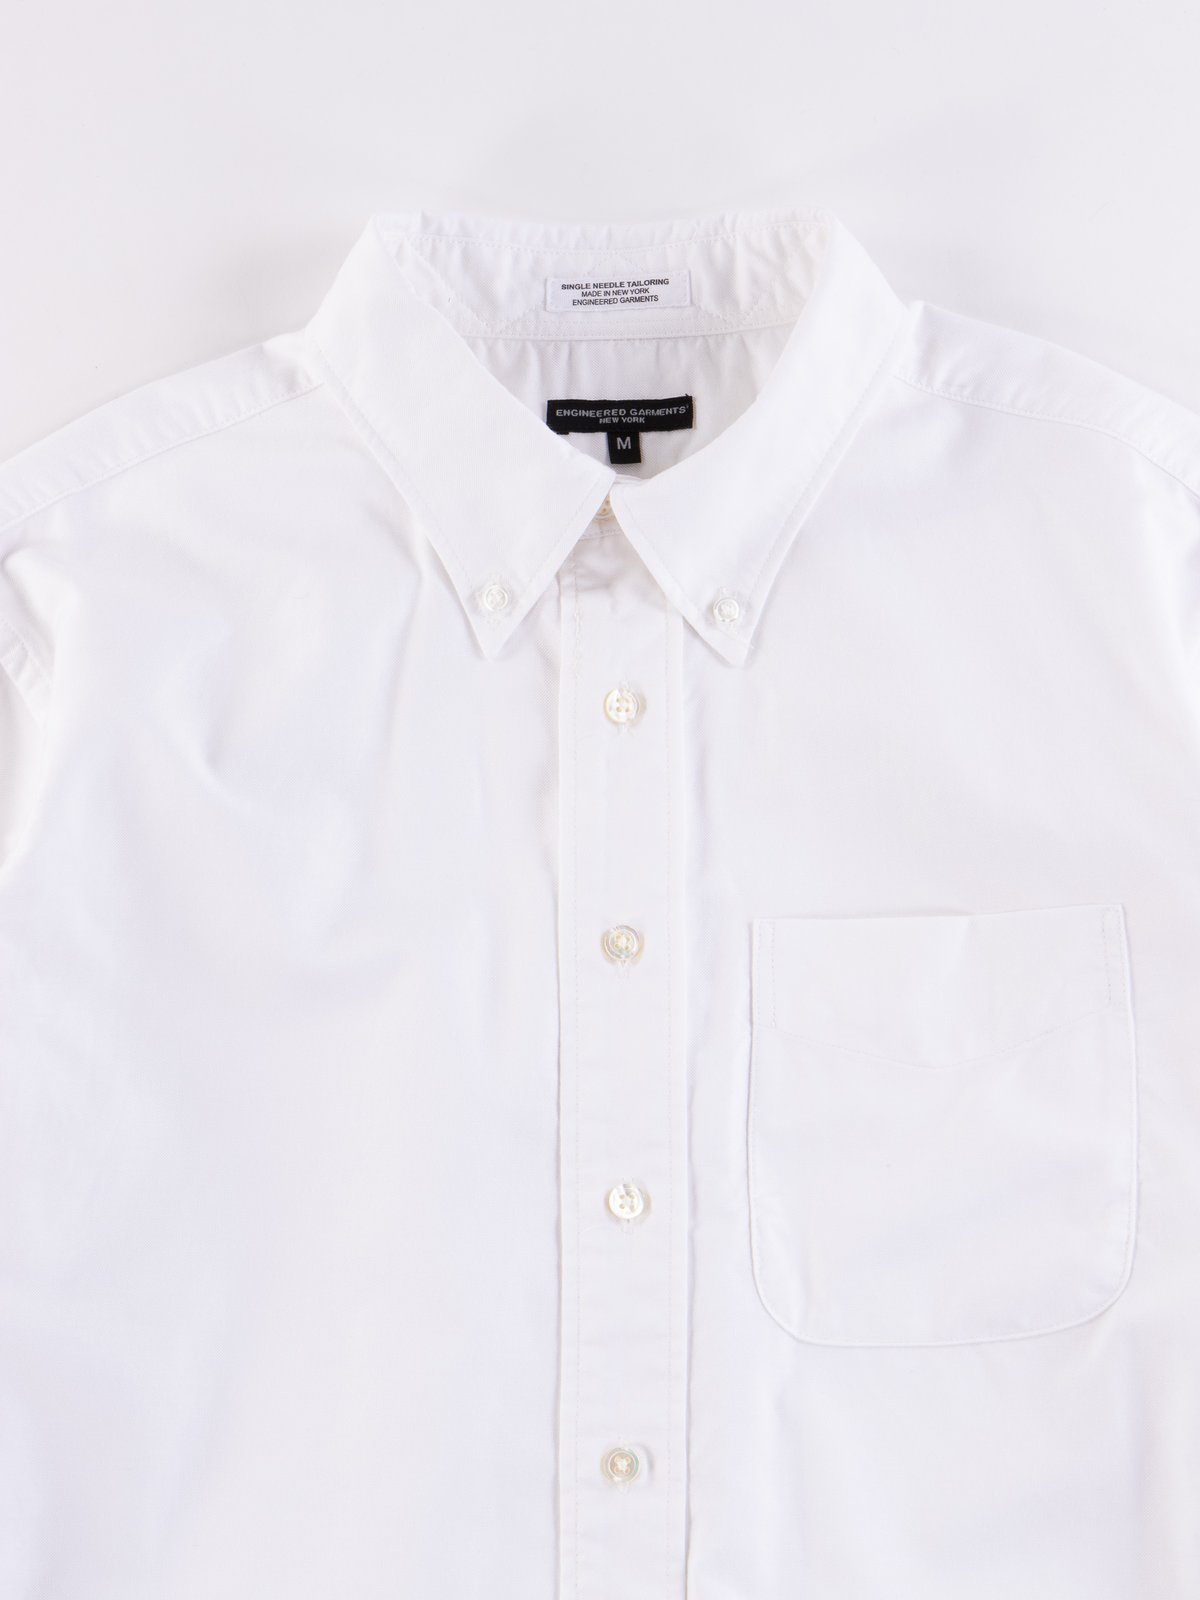 White Cotton Oxford 19th Century BD Shirt - Image 3